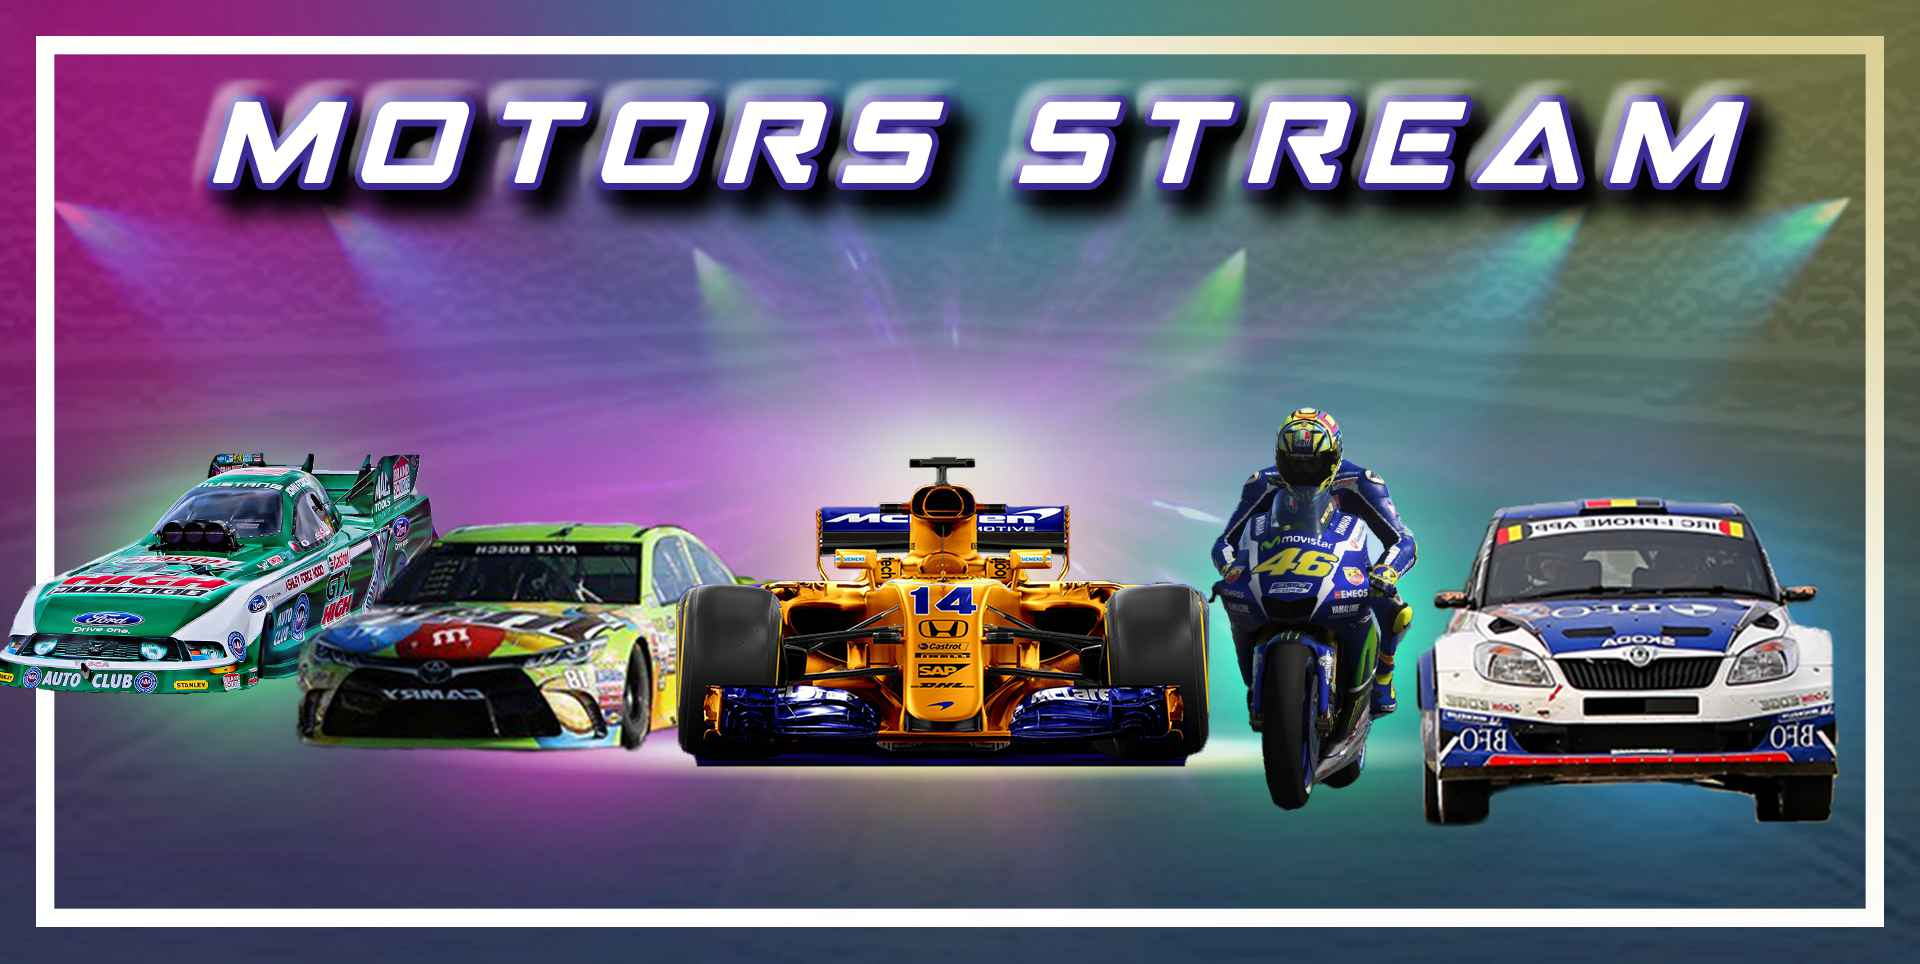 live-world-series-formula-v8-3.5-championship-2017-fixture-telecast